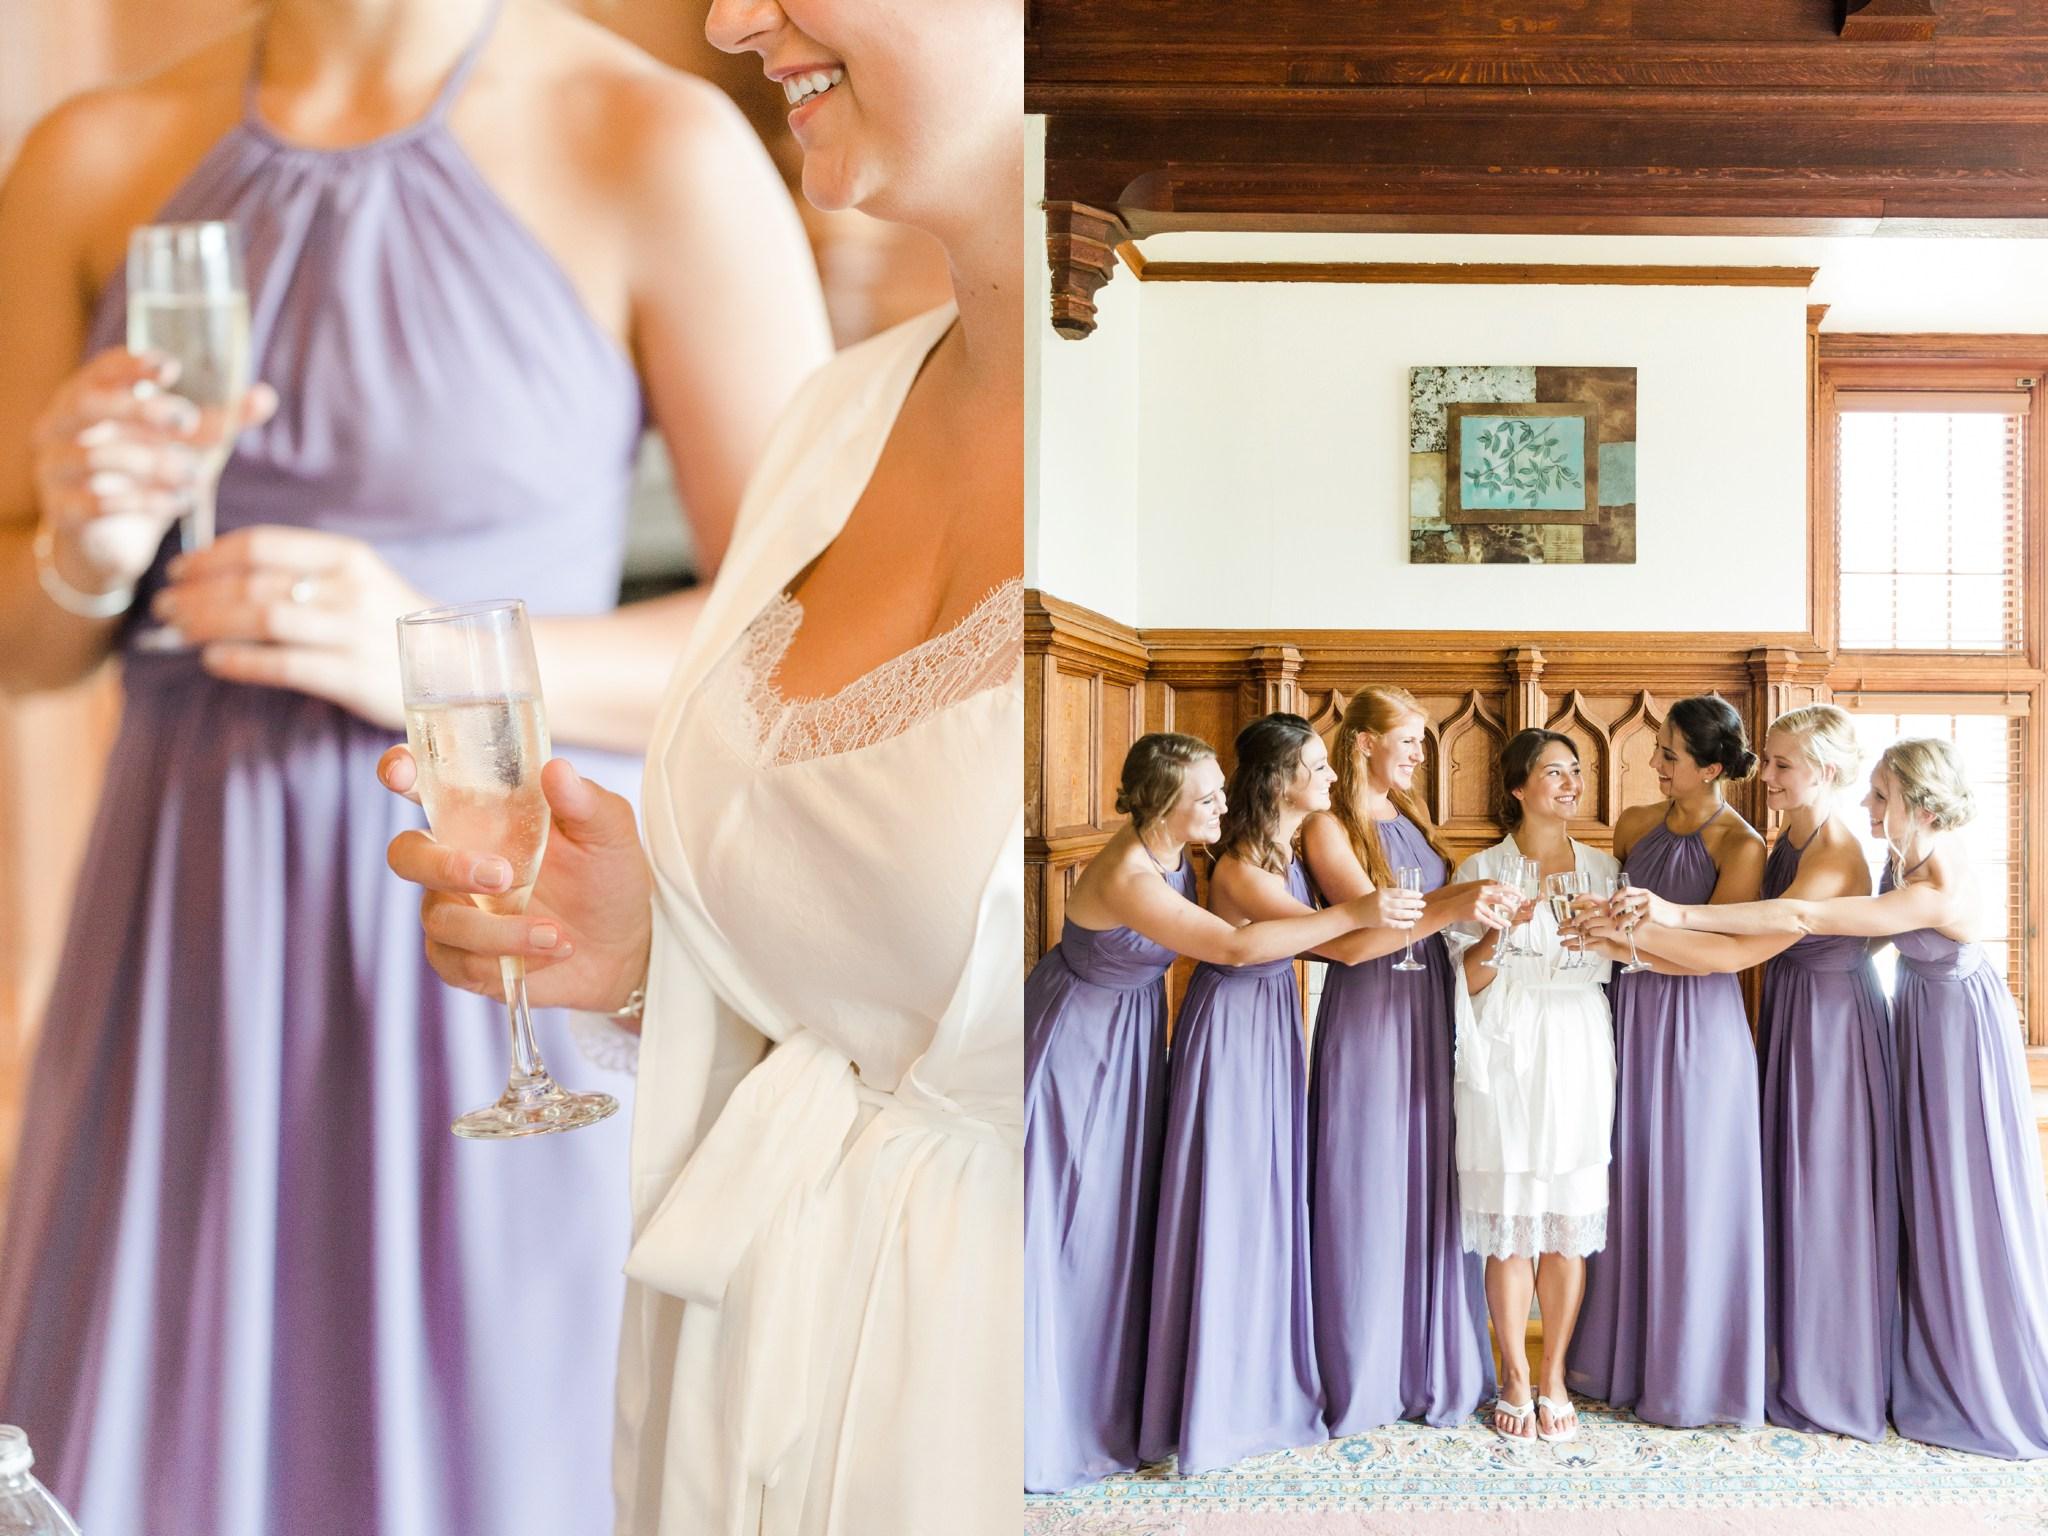 turner_hill_wedding_photos_00010.JPG